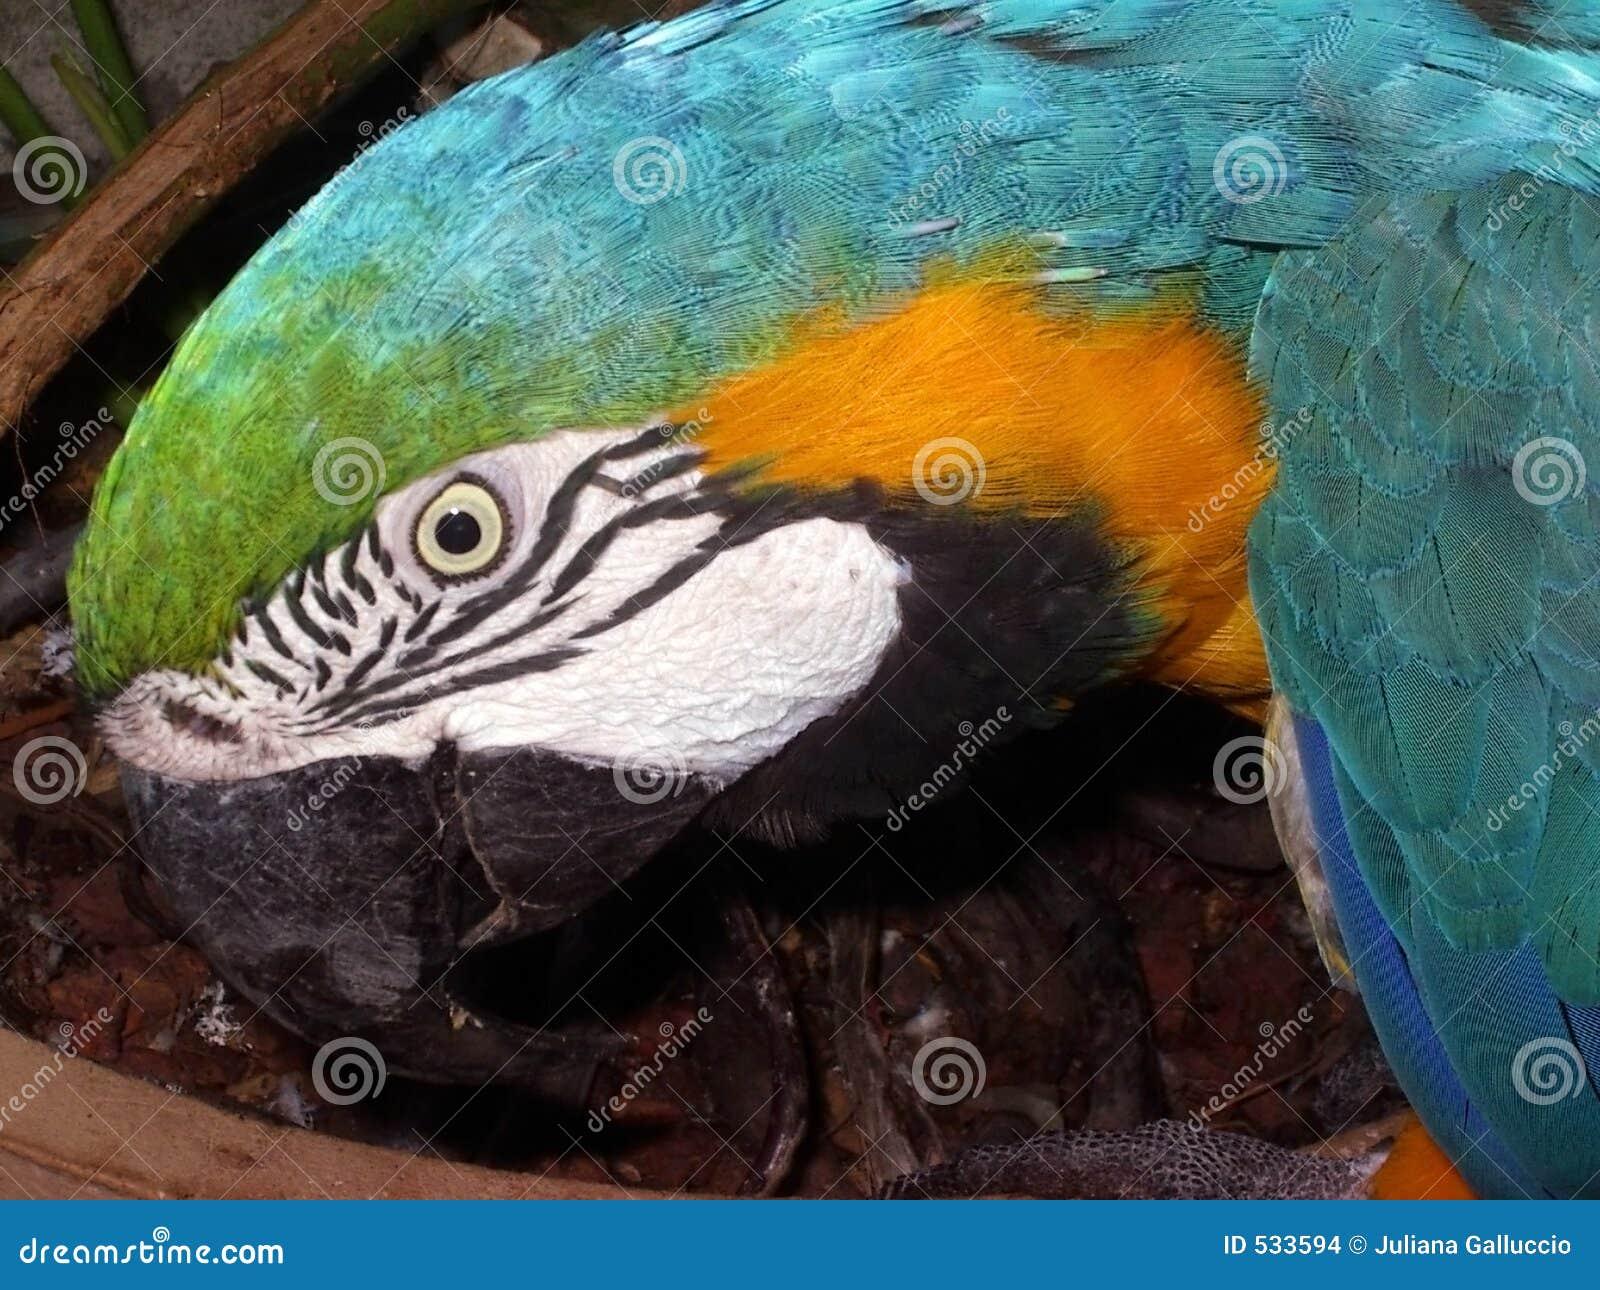 Download 五颜六色的鹦鹉 库存照片. 图片 包括有 自然, 通配, 空白, 宠物, 五颜六色, 黄色, 公开承认, 烧杯 - 533594